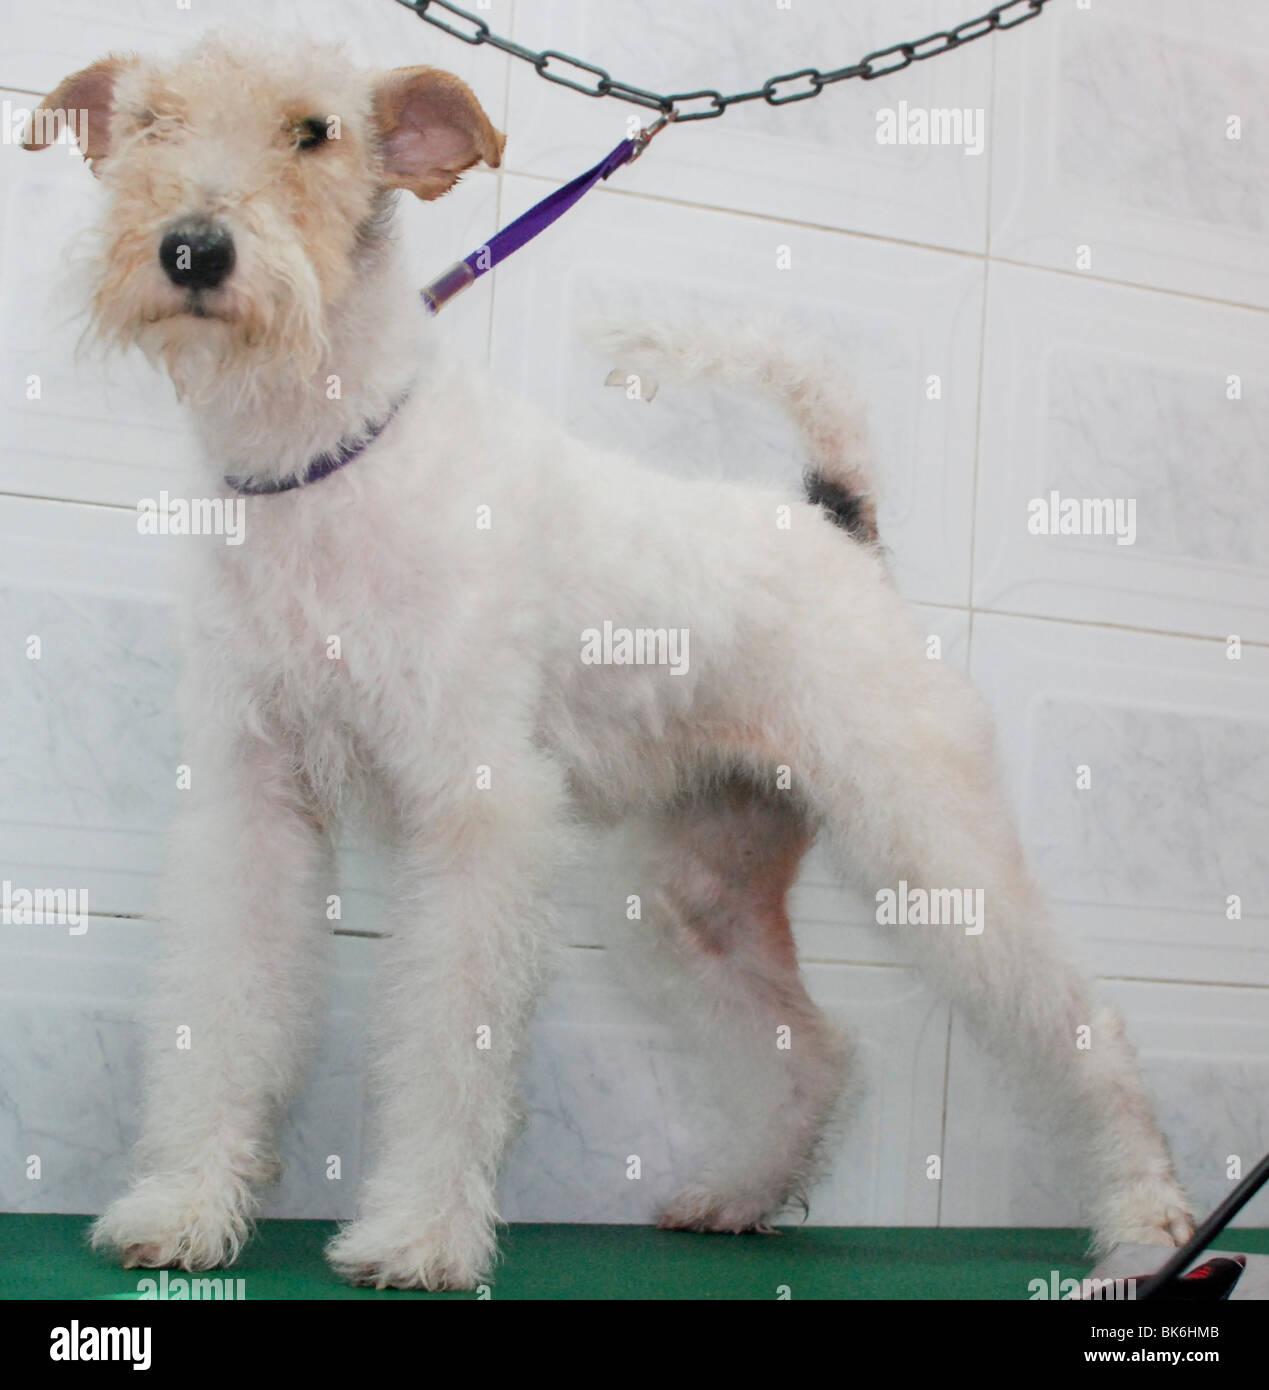 Pedigree Fox Terrier Stock Photos & Pedigree Fox Terrier Stock ...